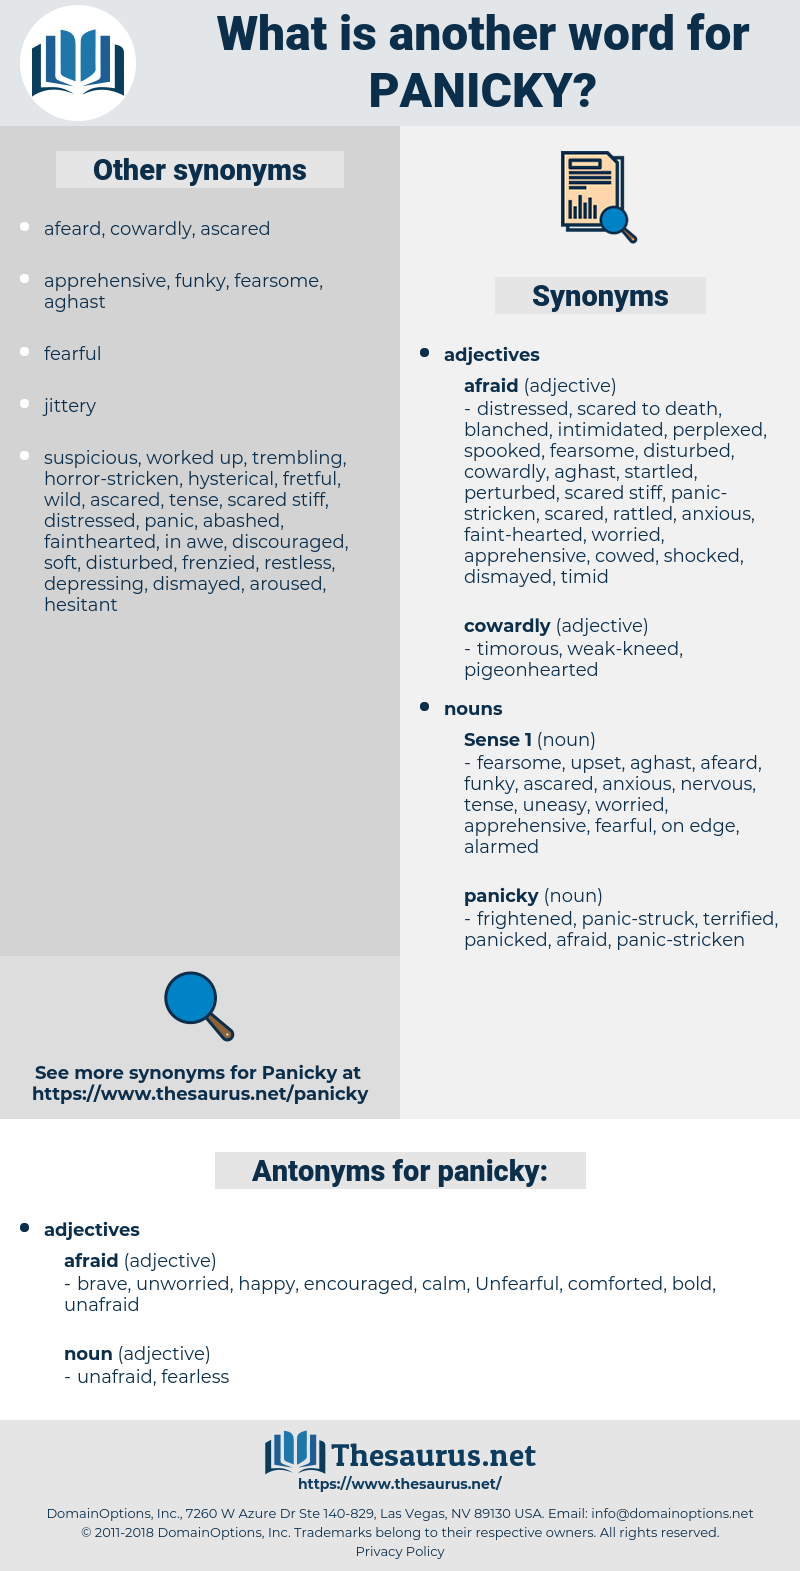 panicky, synonym panicky, another word for panicky, words like panicky, thesaurus panicky